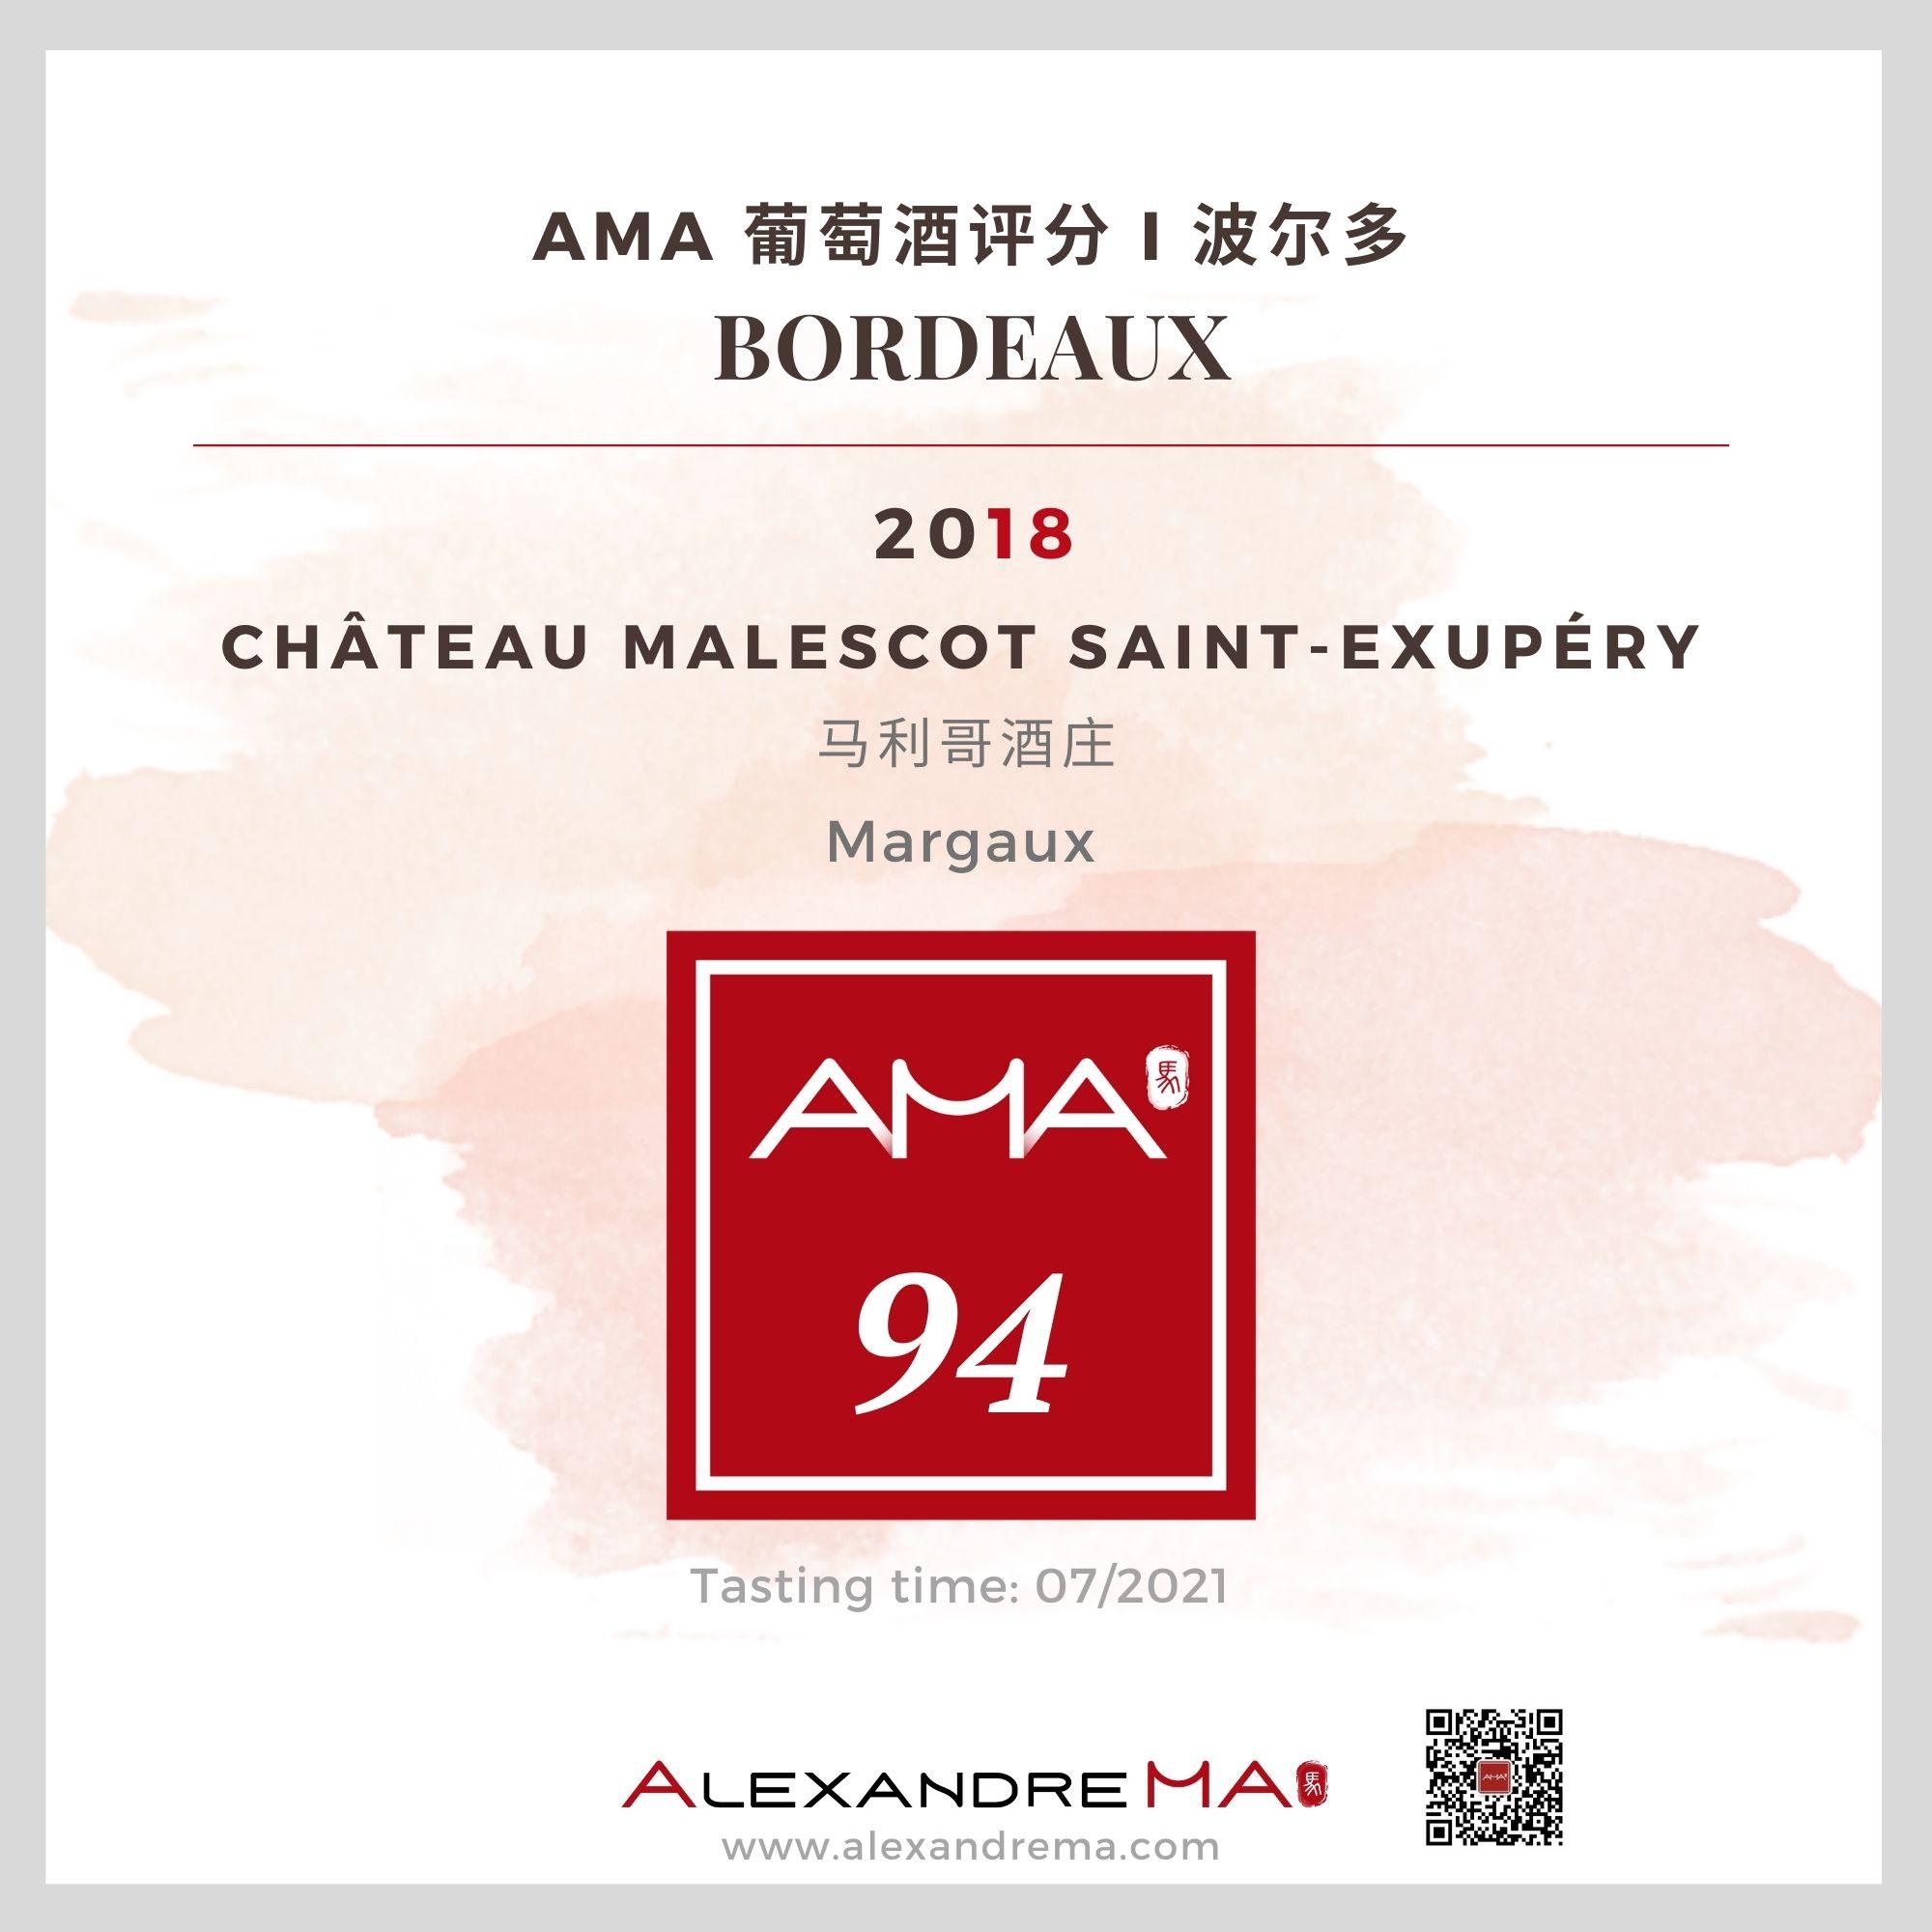 Château Malescot Saint-Exupéry 2018 马利哥酒庄 - Alexandre Ma